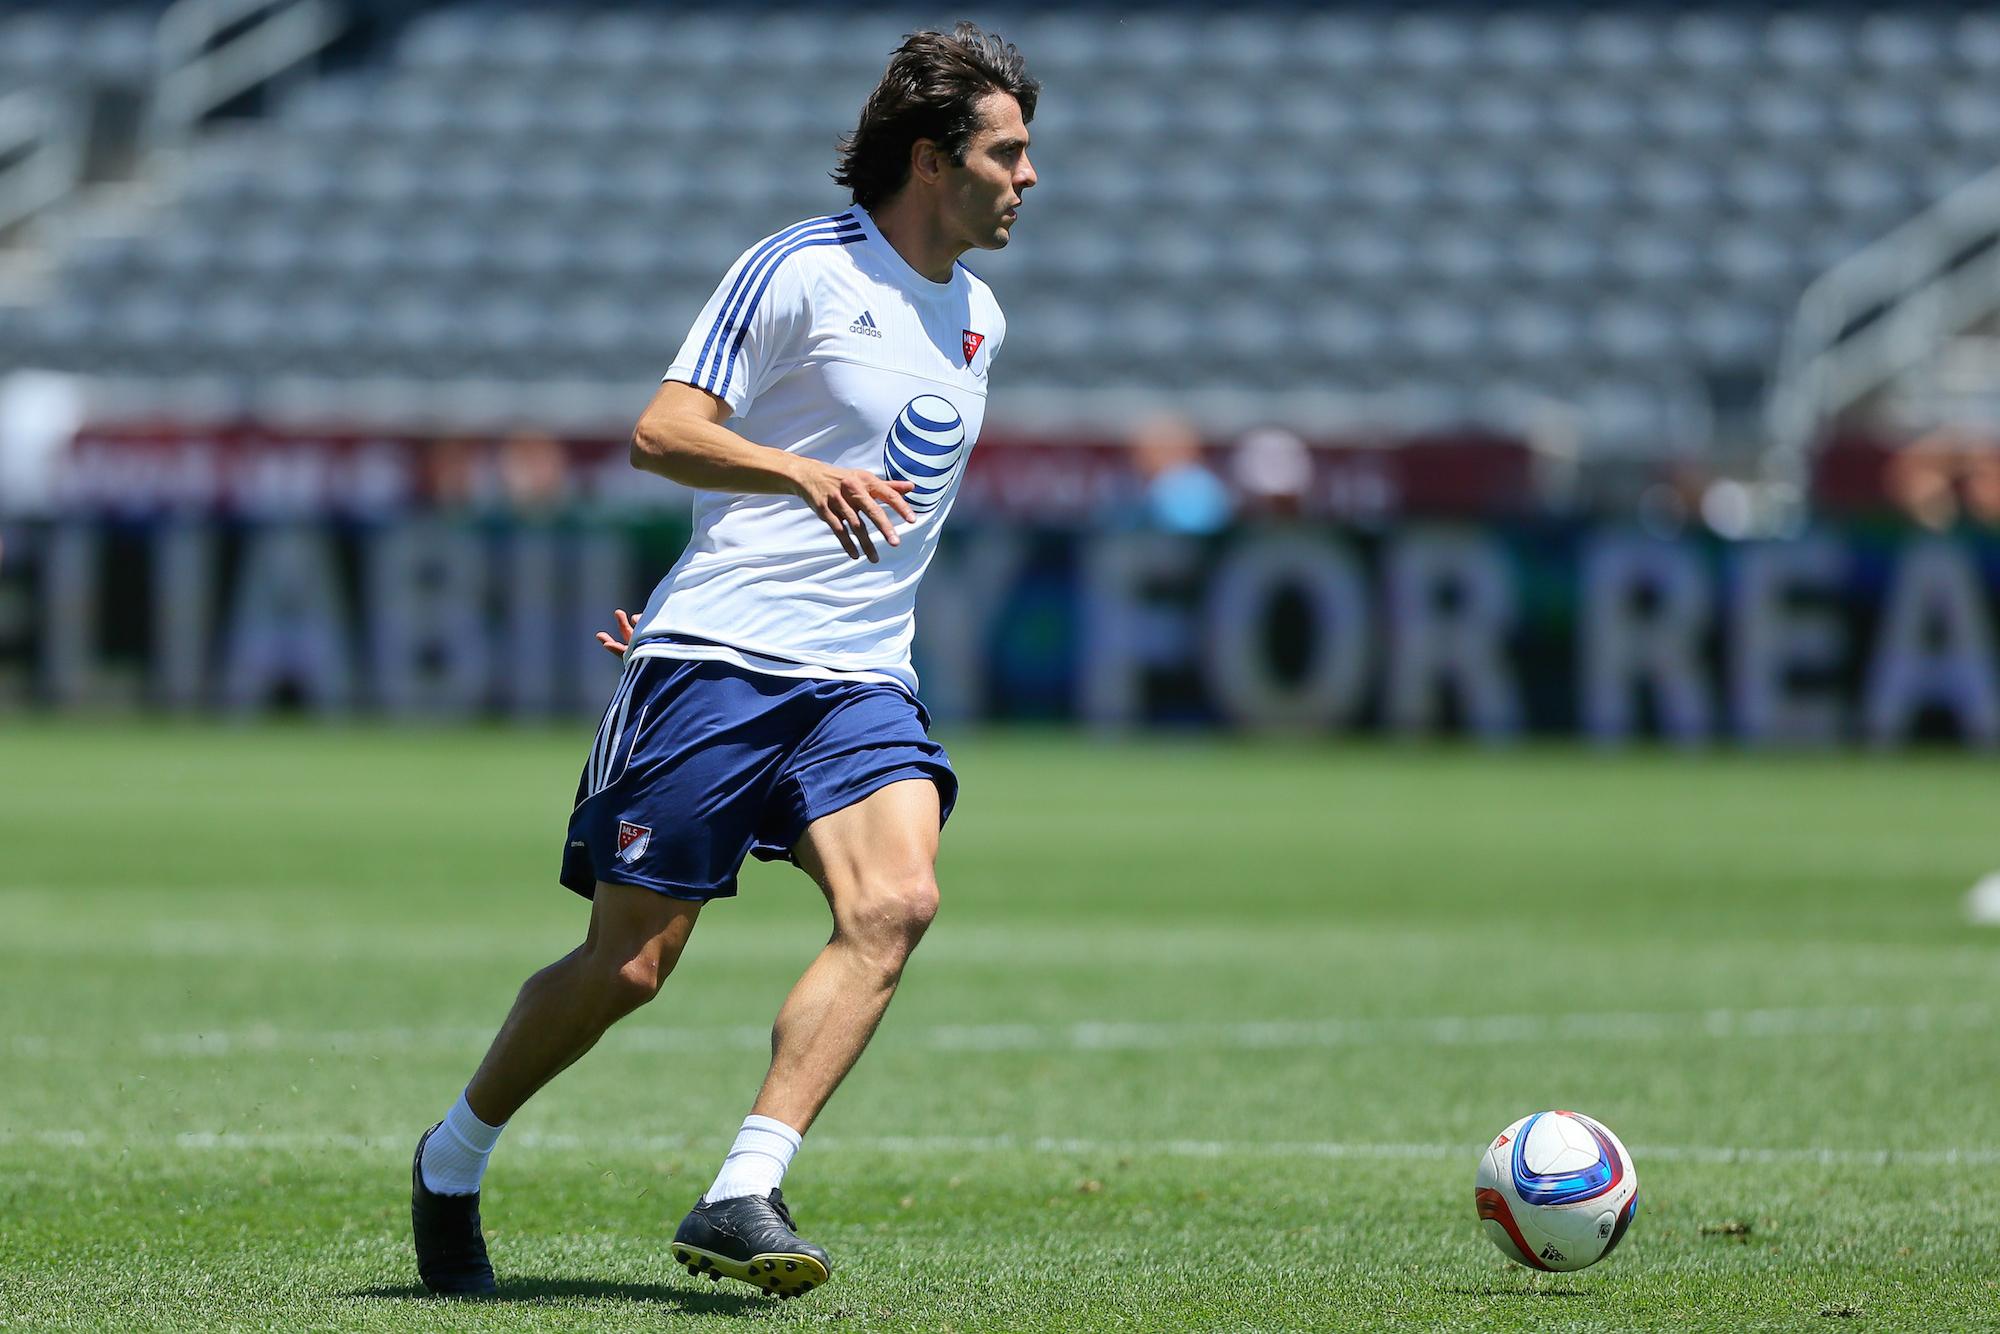 MLS All-Stars Training Session